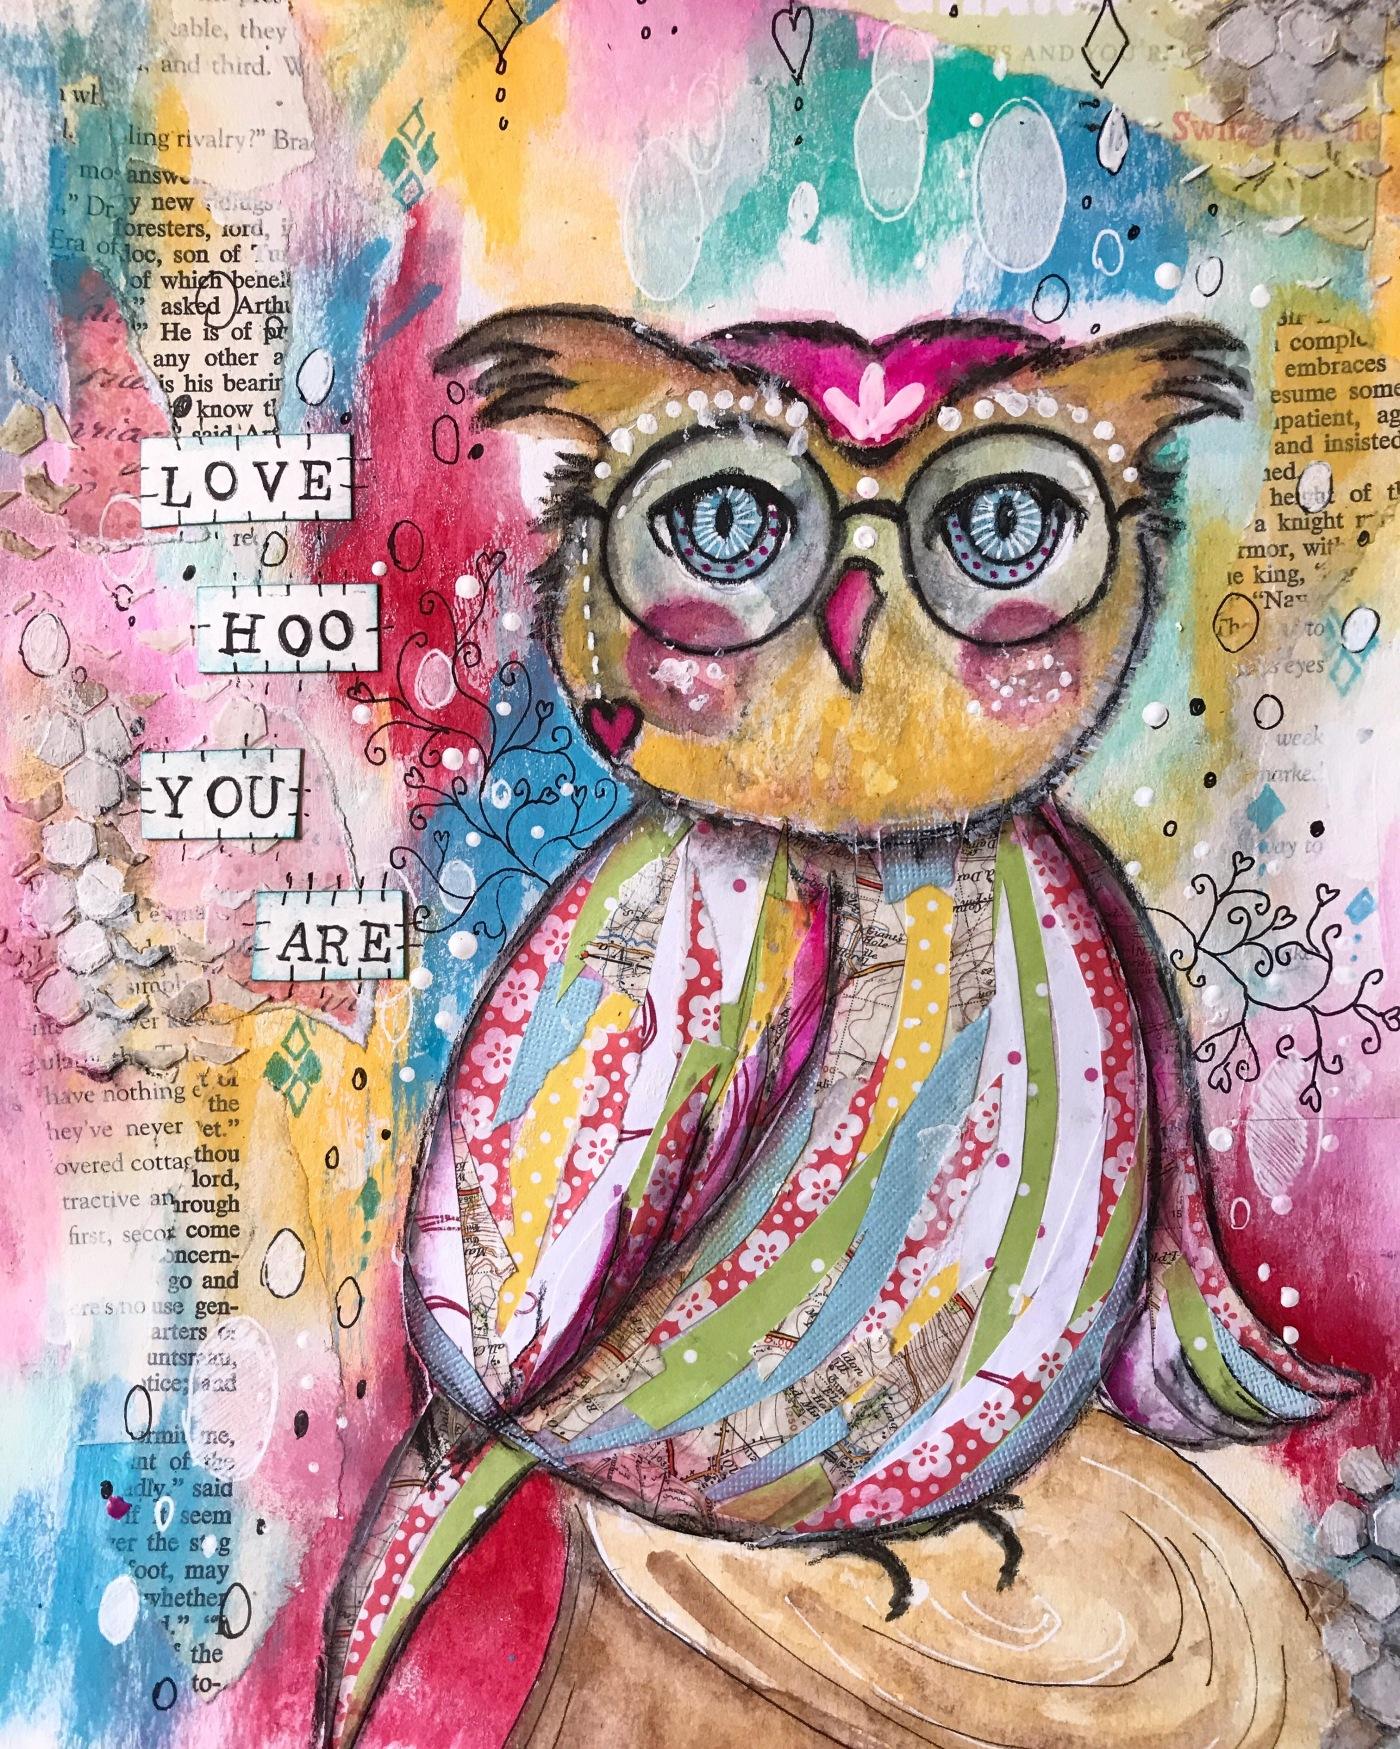 Love HOO you are – justpaintandplay